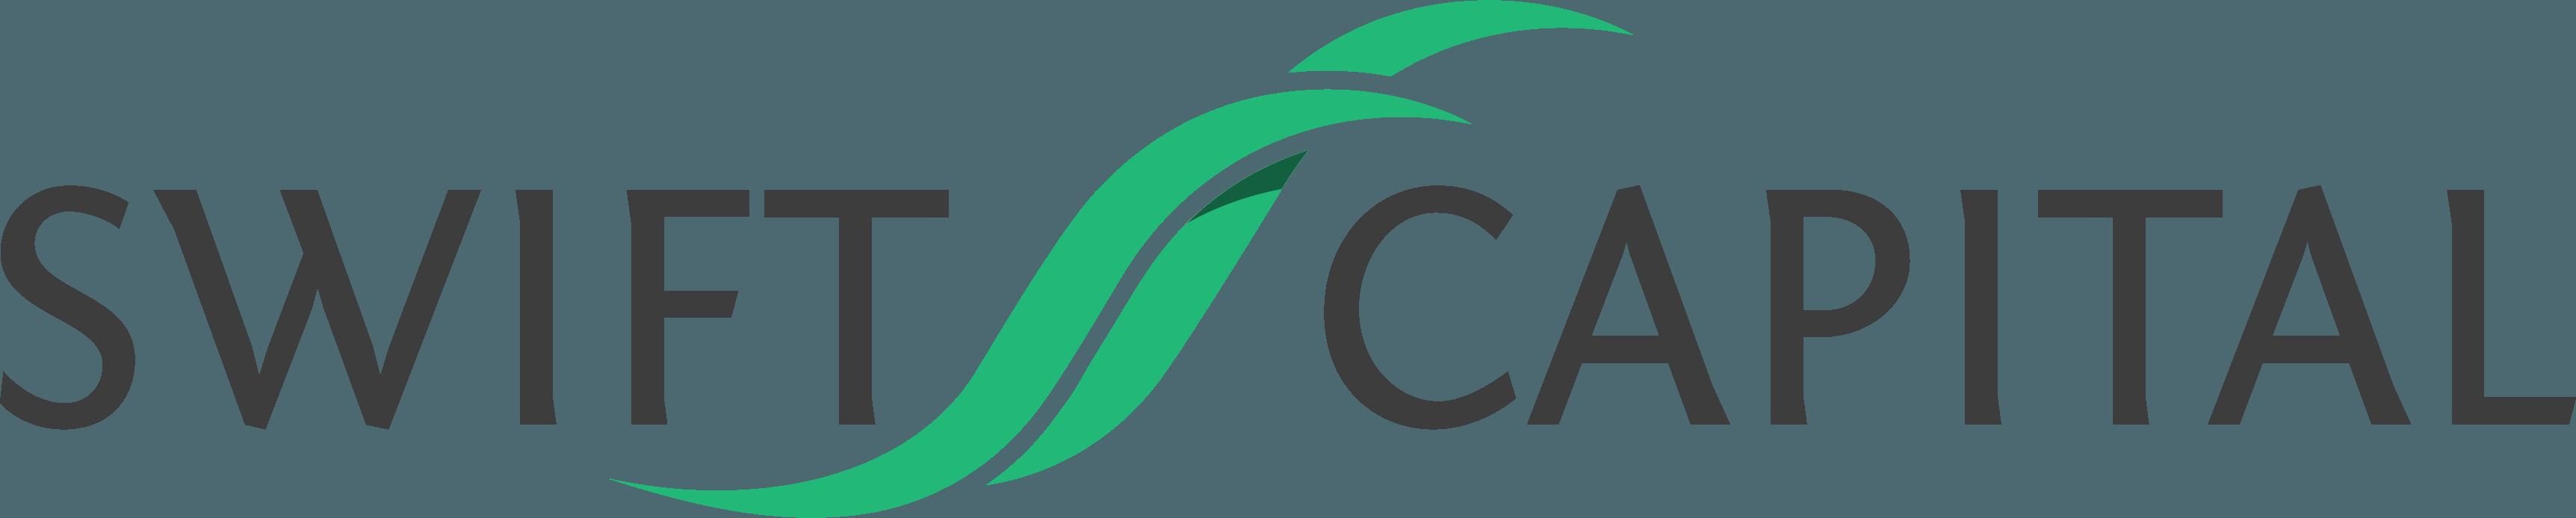 Swift Capital Reviews